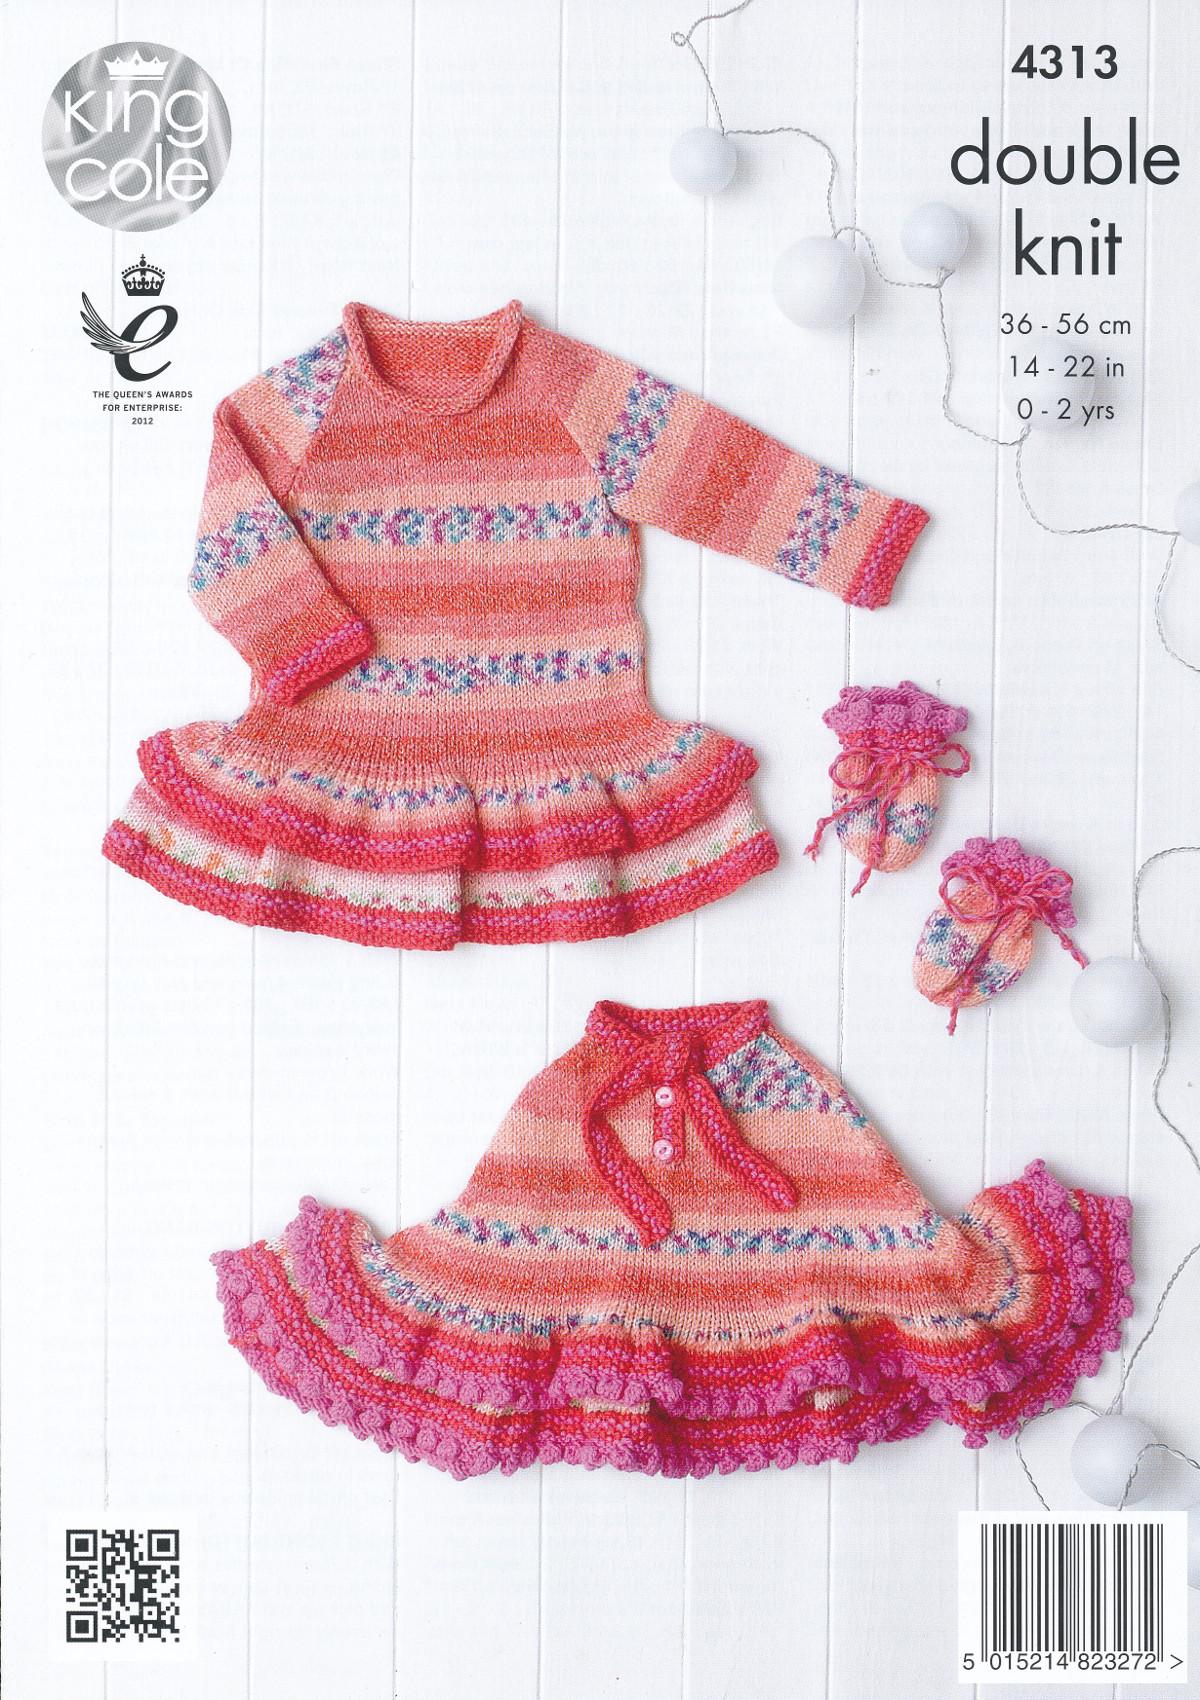 Double Knitting Hoodie Pattern : Baby Drifter DK Knitting Pattern King Cole Hoodie Dress ...